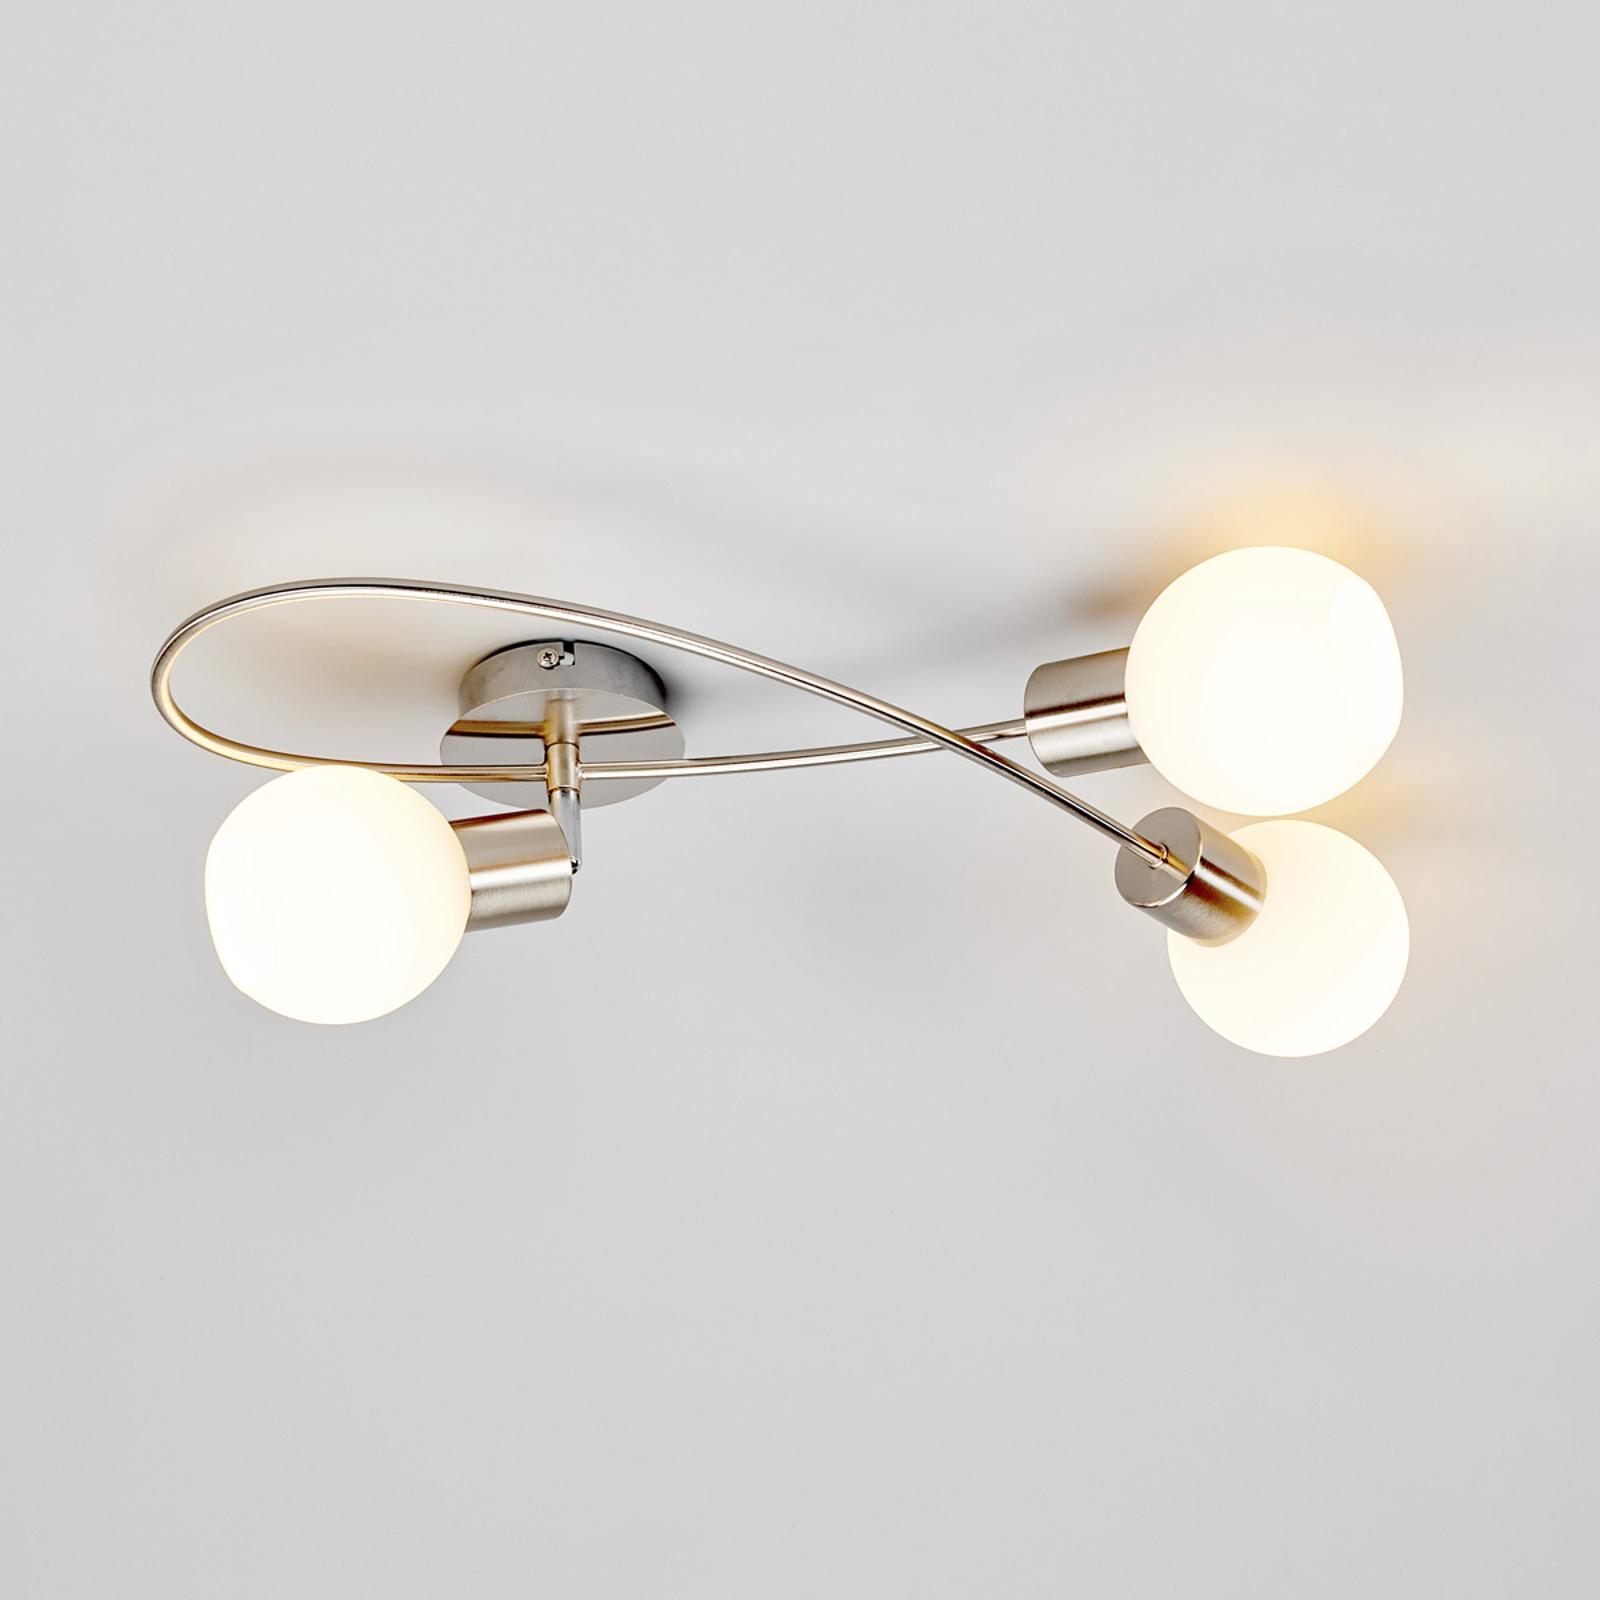 Elegancka lampa sufitowa LED ELAINA, 3pkt., nikiel